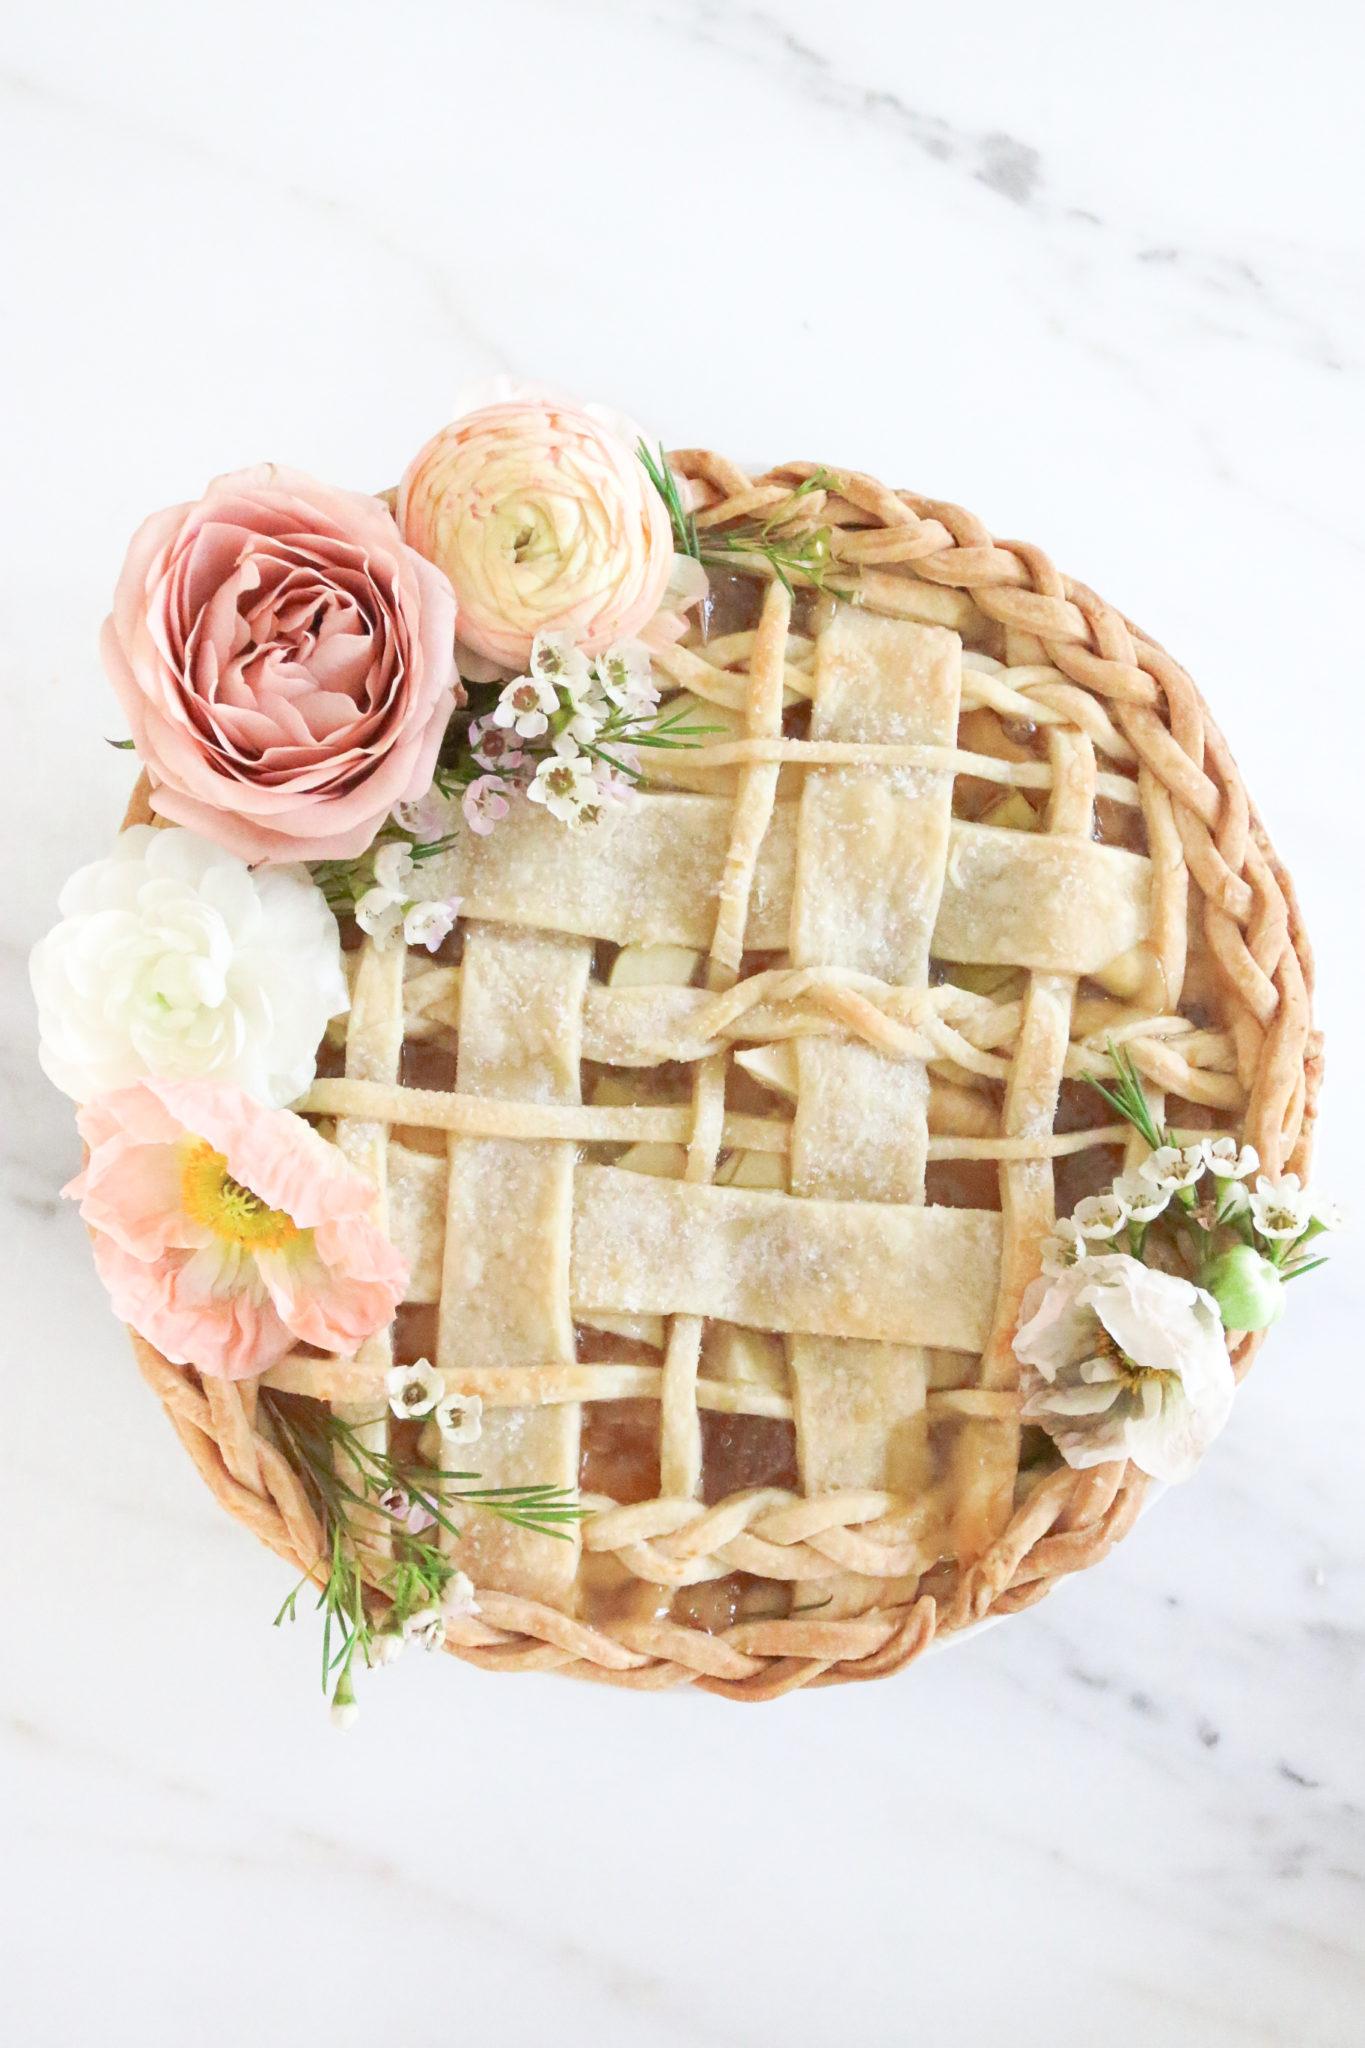 Pinktastic Saturday: Prettiest Apple Pie Ever!